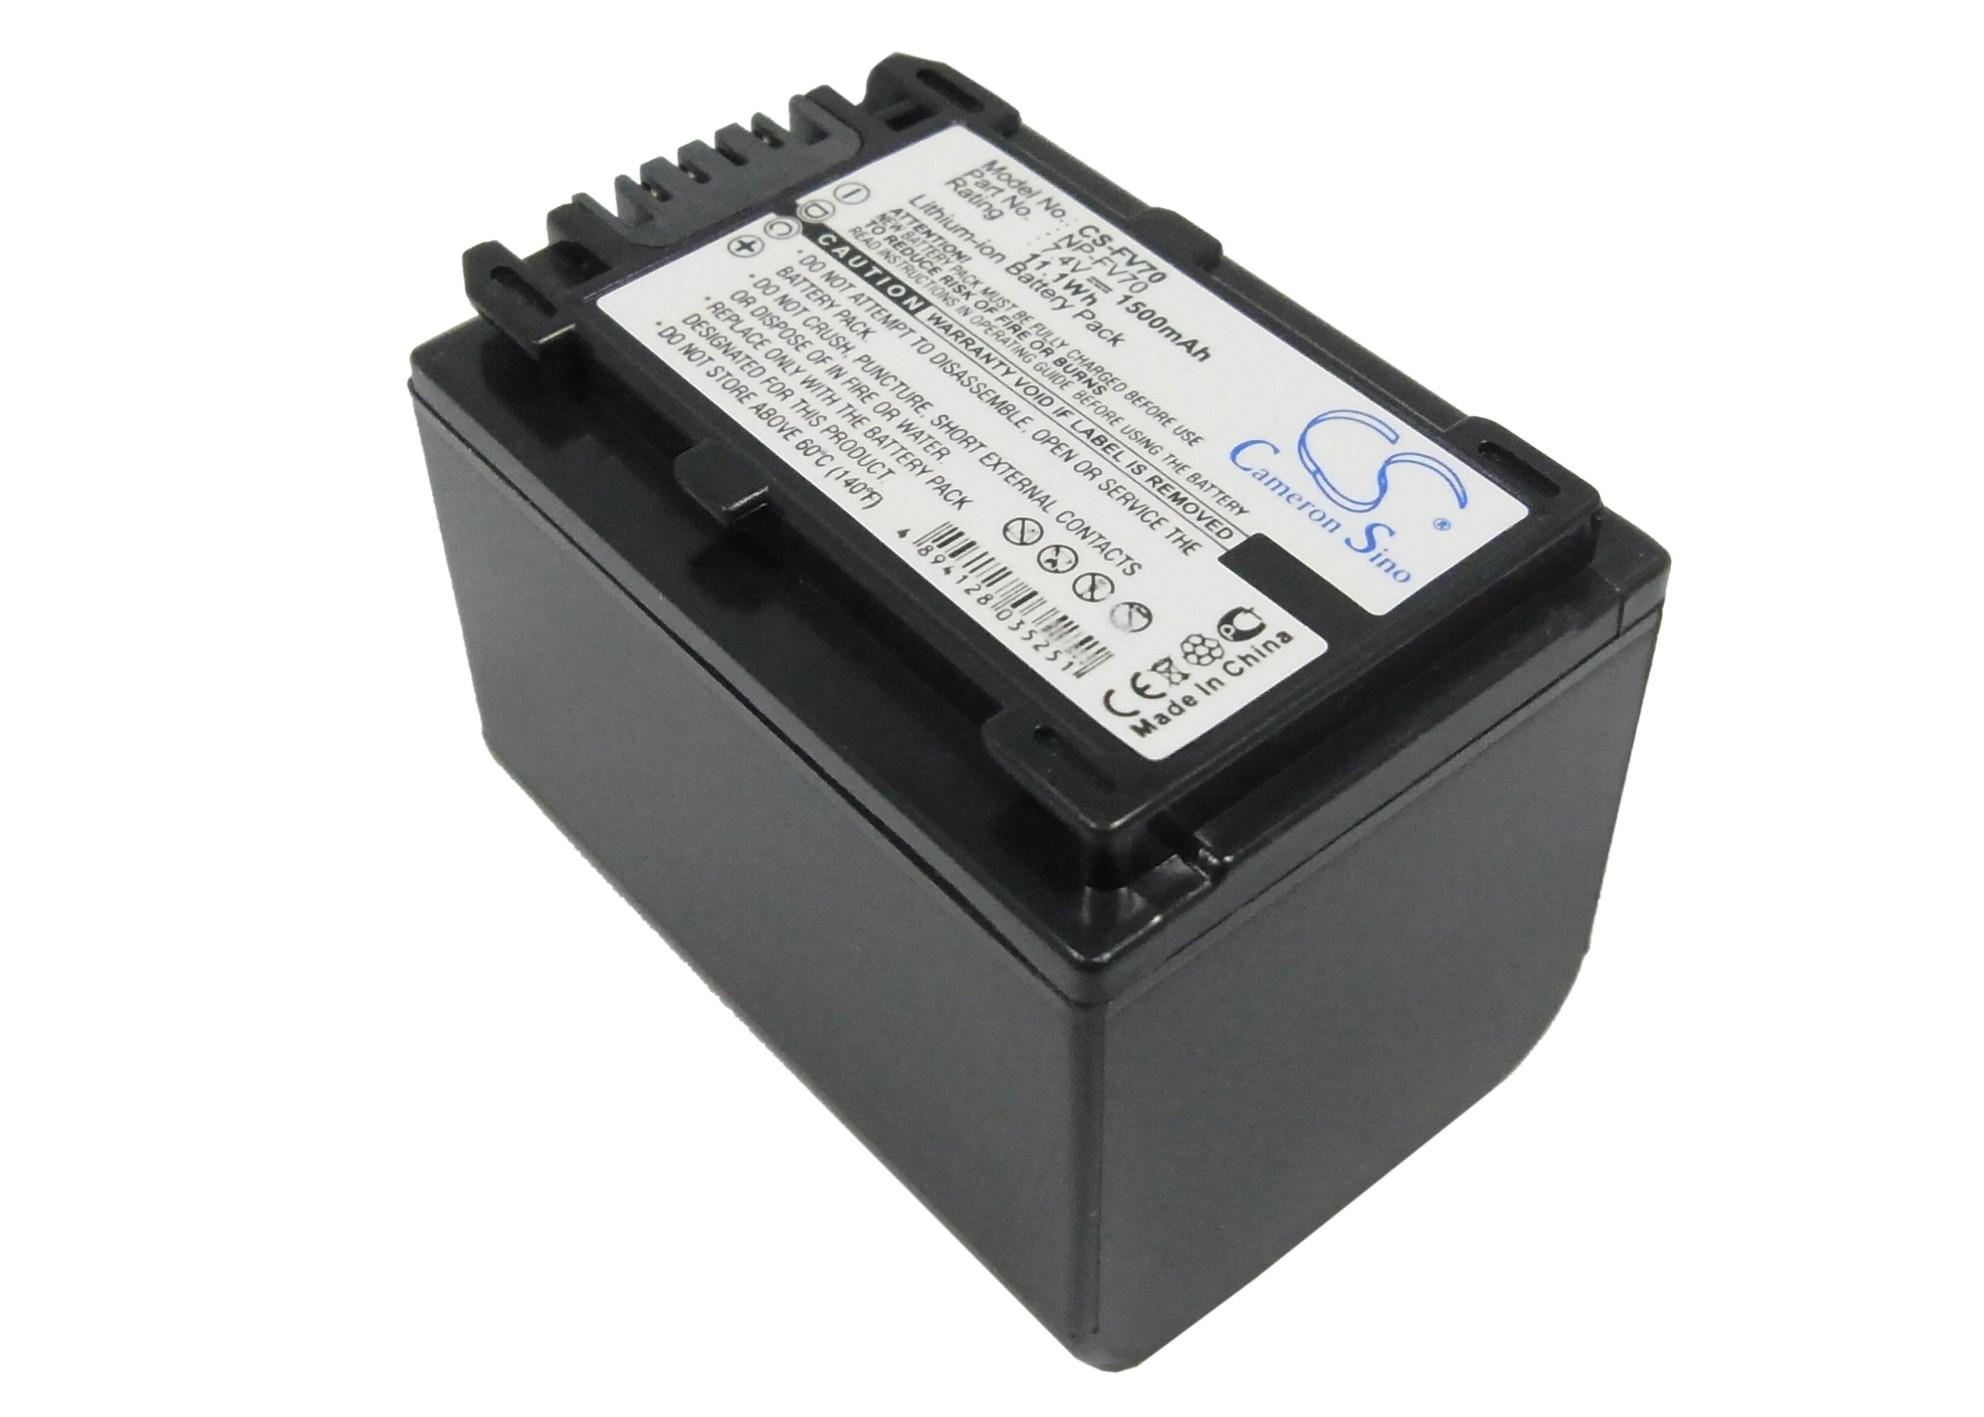 Cameron Sino baterie do kamer a fotoaparátů pro SONY DCR-DVD150E 7.4V Li-ion 1500mAh černá - neoriginální